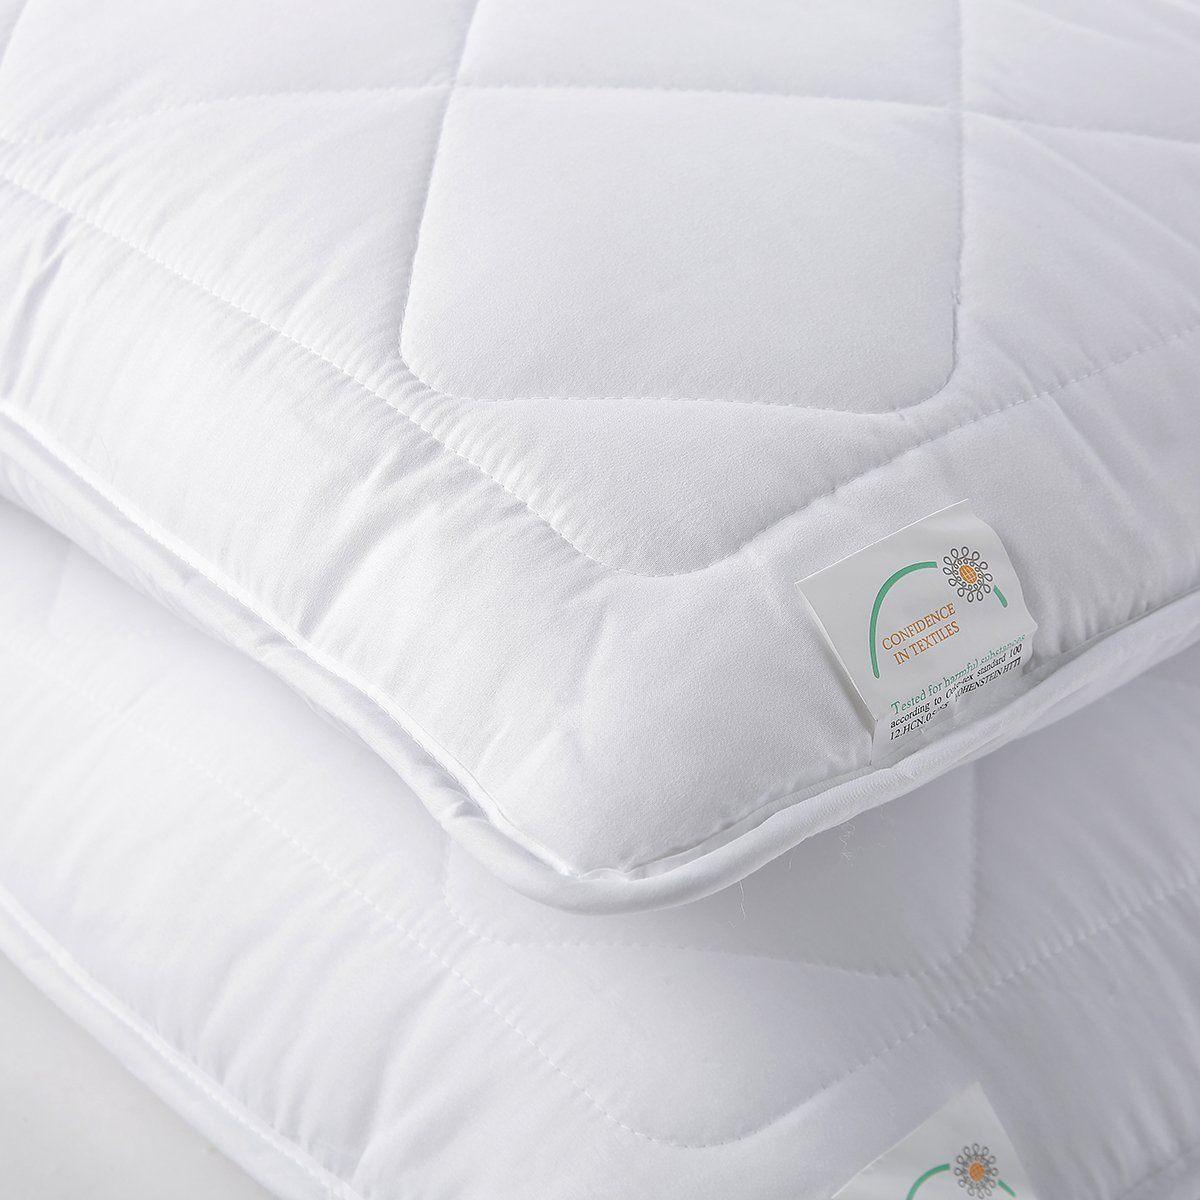 ergomaxx kopfkissen ikea lattenroste test neurodermitis bettw sche bettdecken g nsedaunen. Black Bedroom Furniture Sets. Home Design Ideas